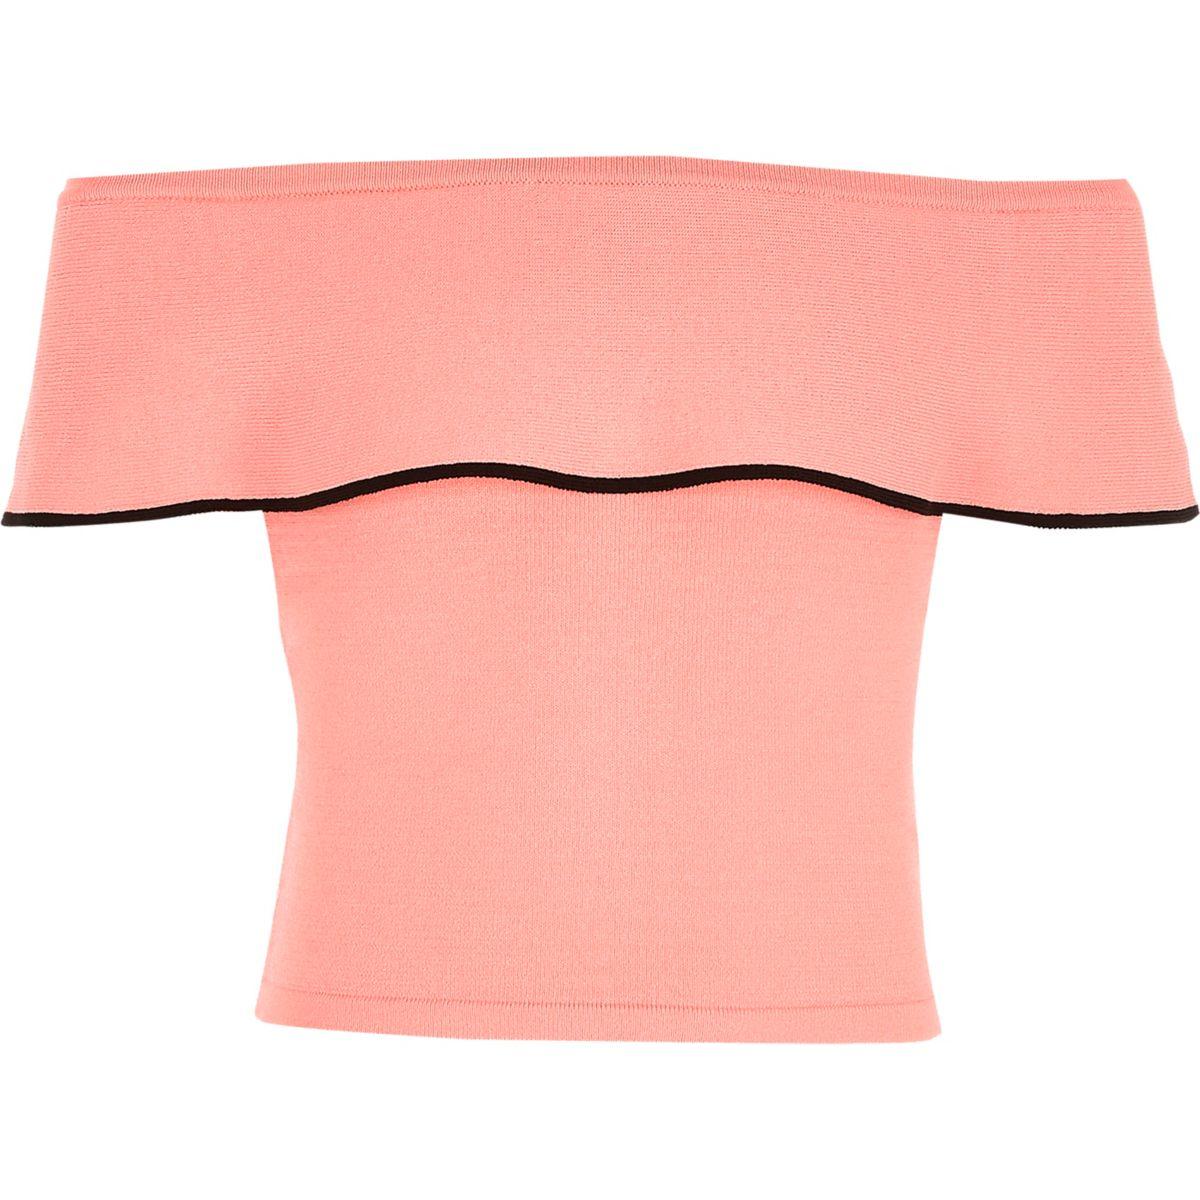 Pinkes Bardot-Crop Top